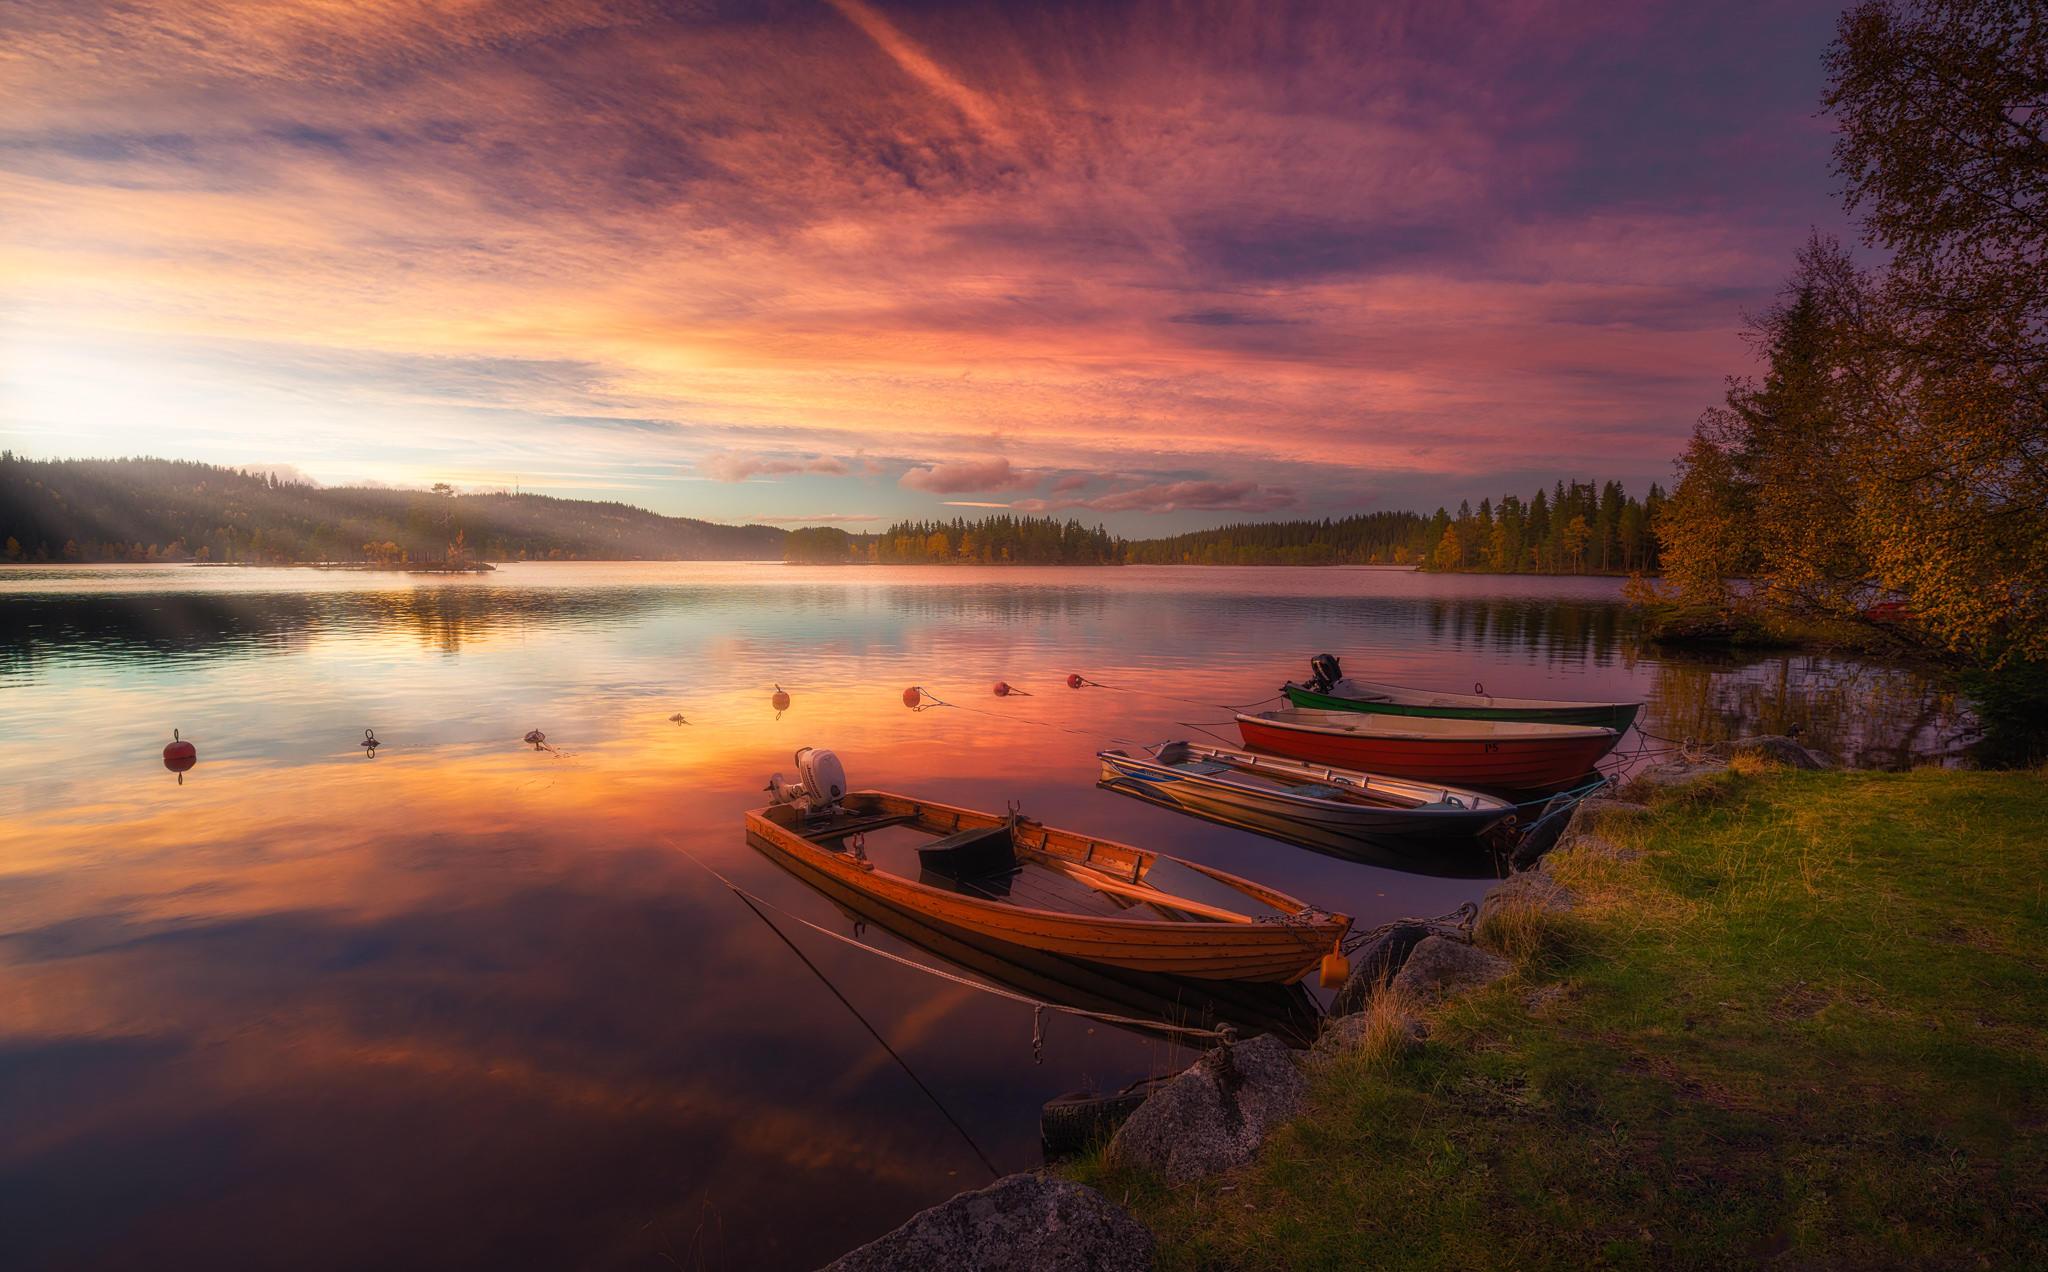 обои Рингерике, Норвегия, закат, река картинки фото